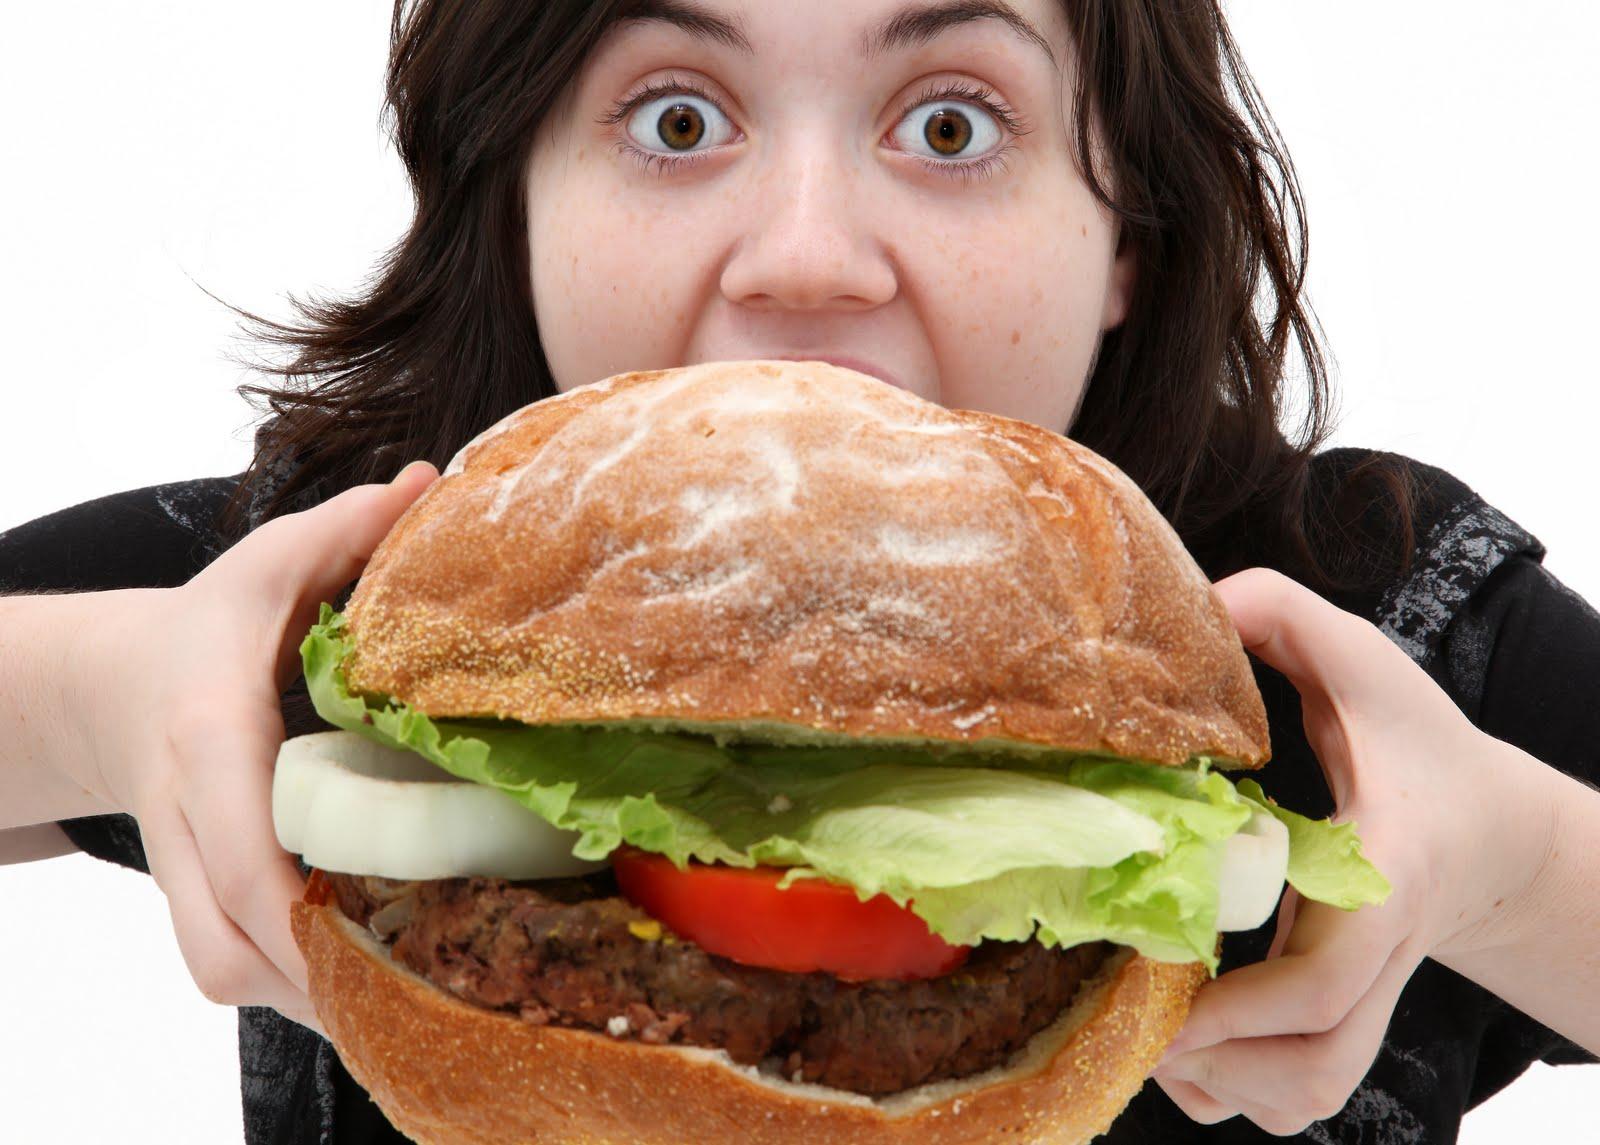 woman-eating-sandwich.jpg